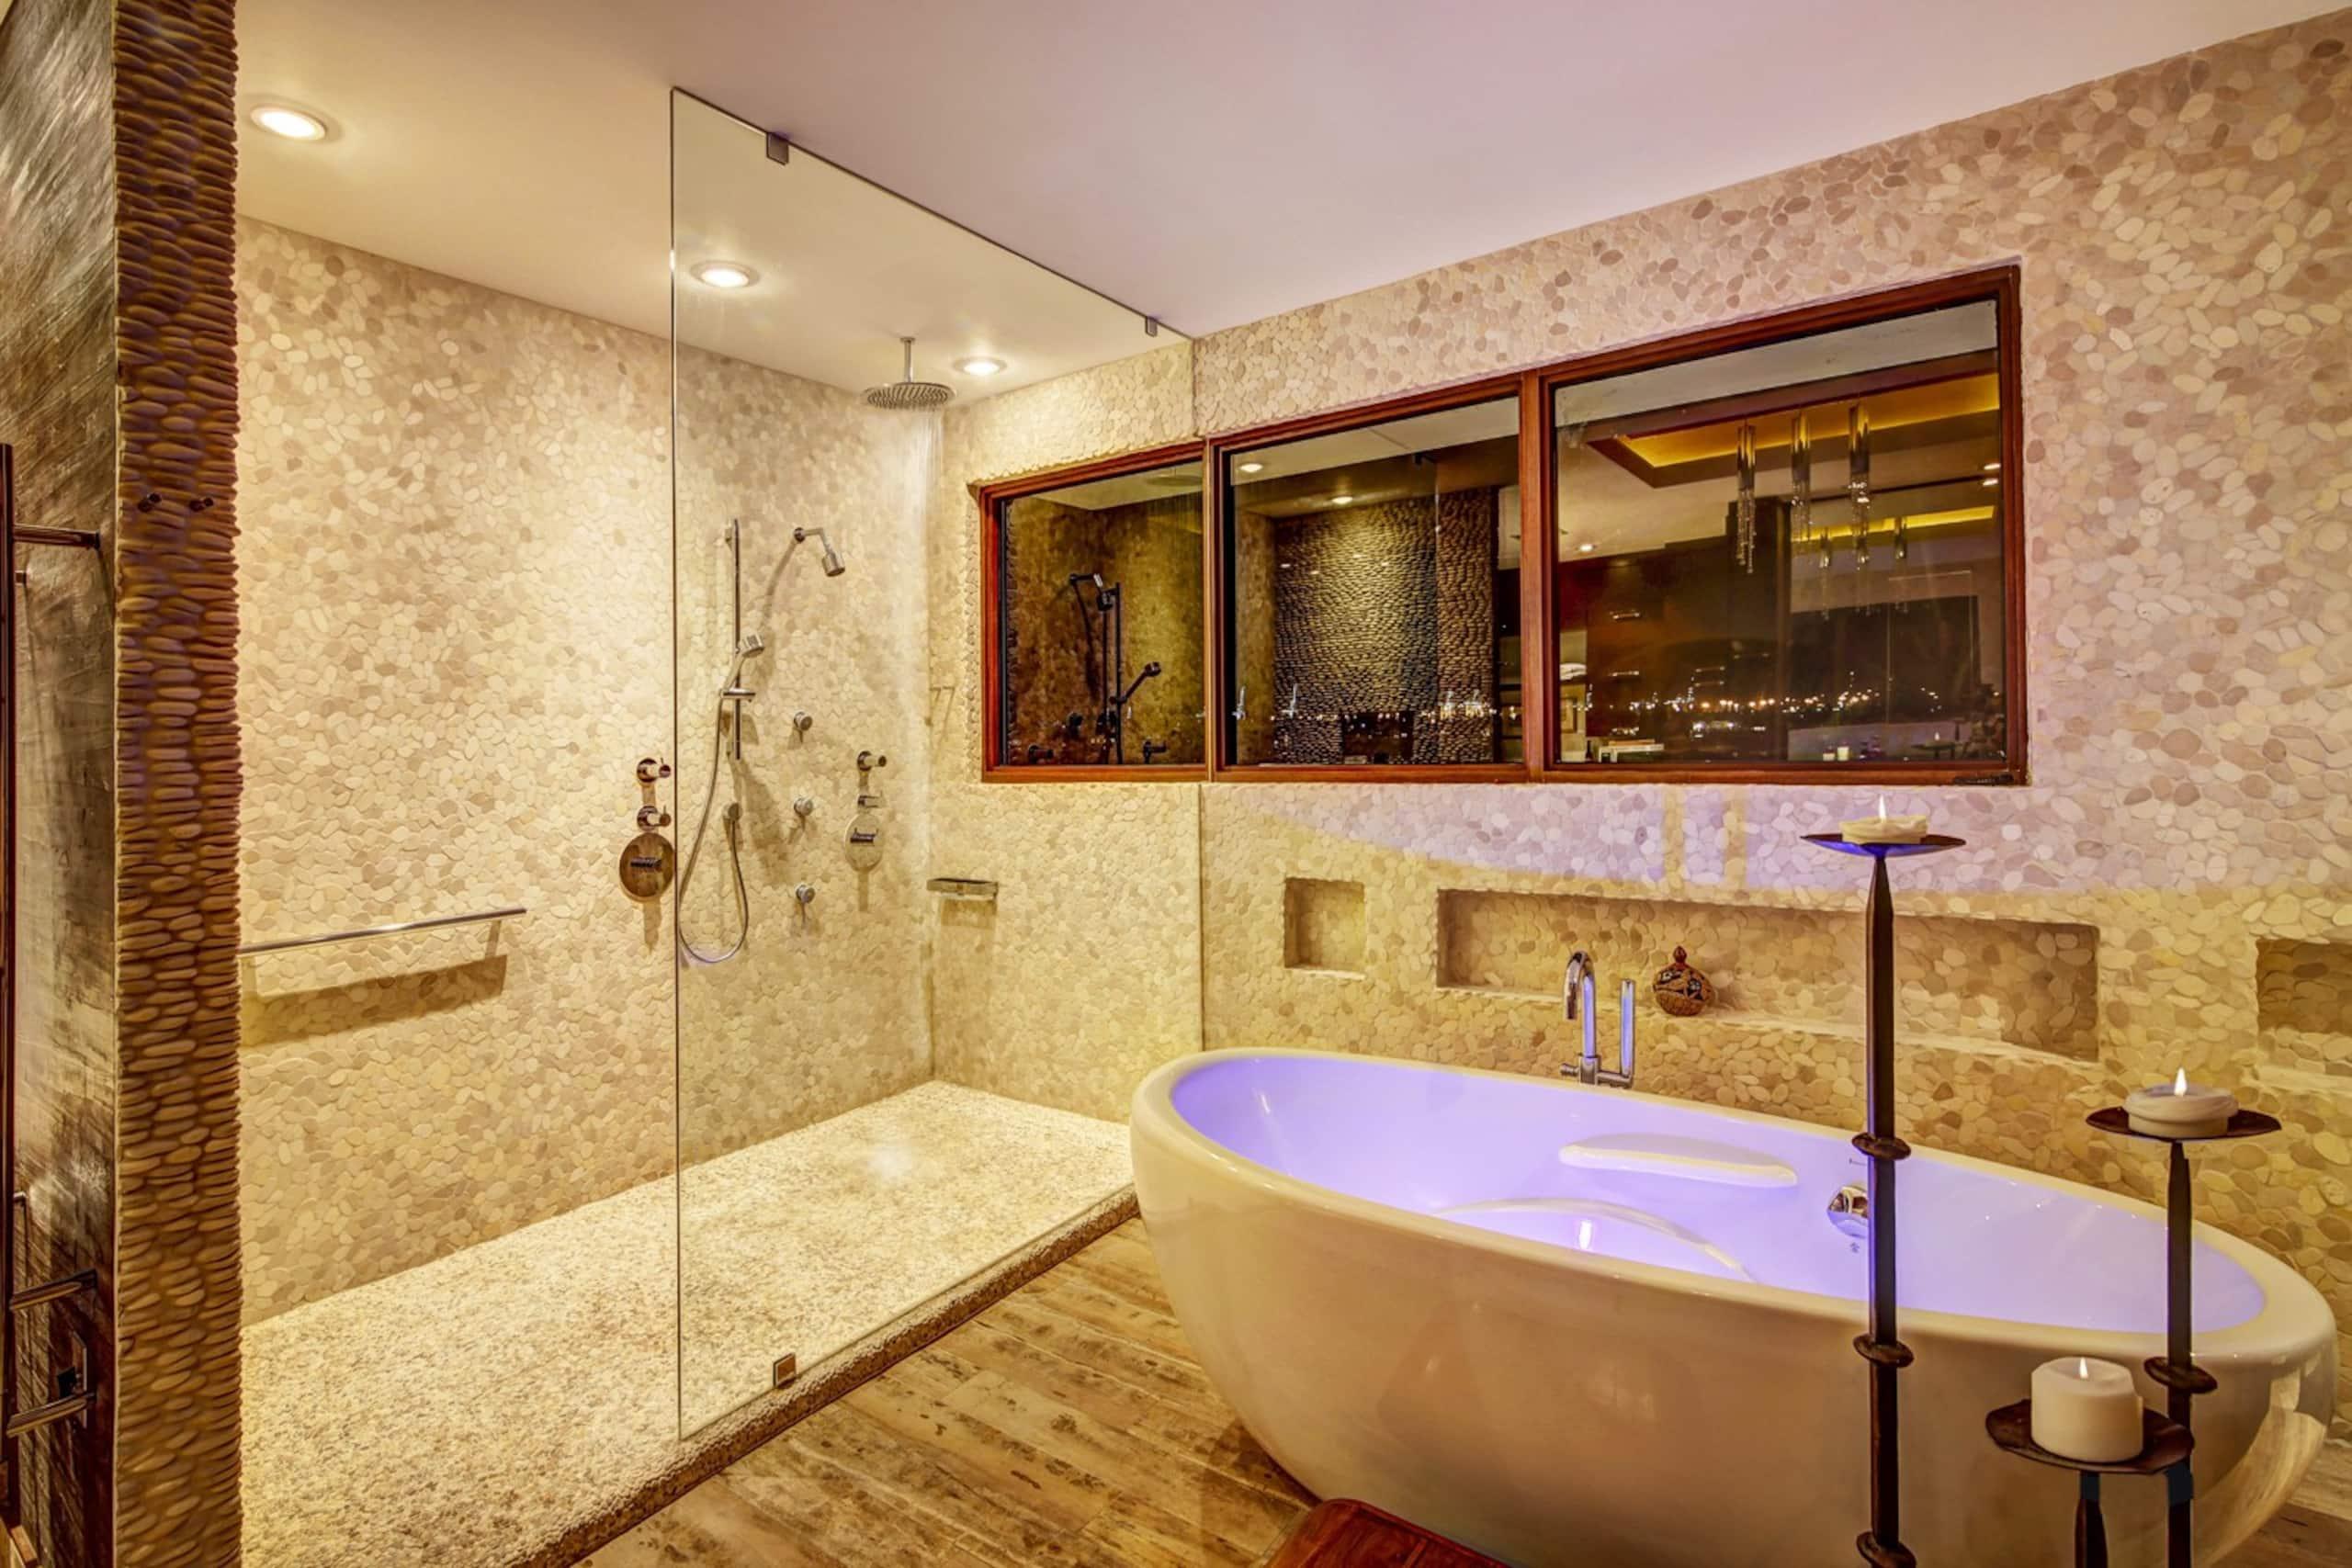 Apartment Villa Riza - Magnificent Balinese-style photo 20355446